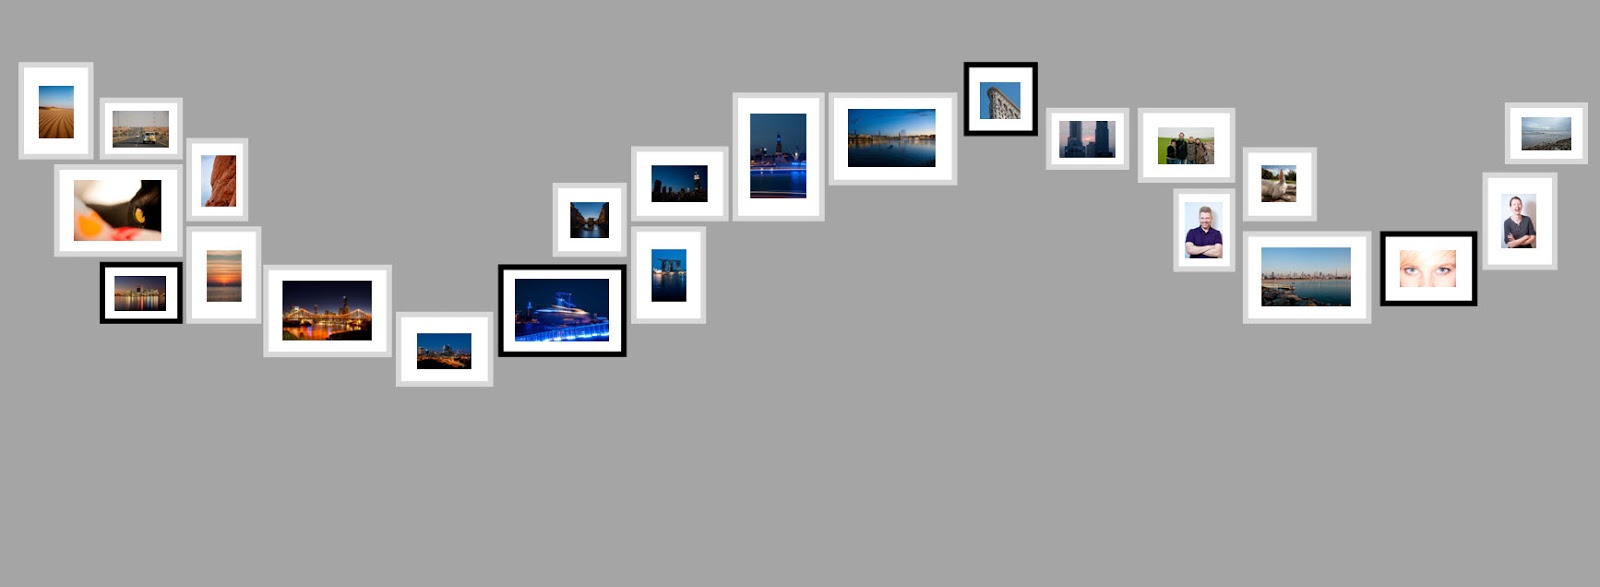 f o t o j o m o johannes modersohn photography projekt fotowand. Black Bedroom Furniture Sets. Home Design Ideas